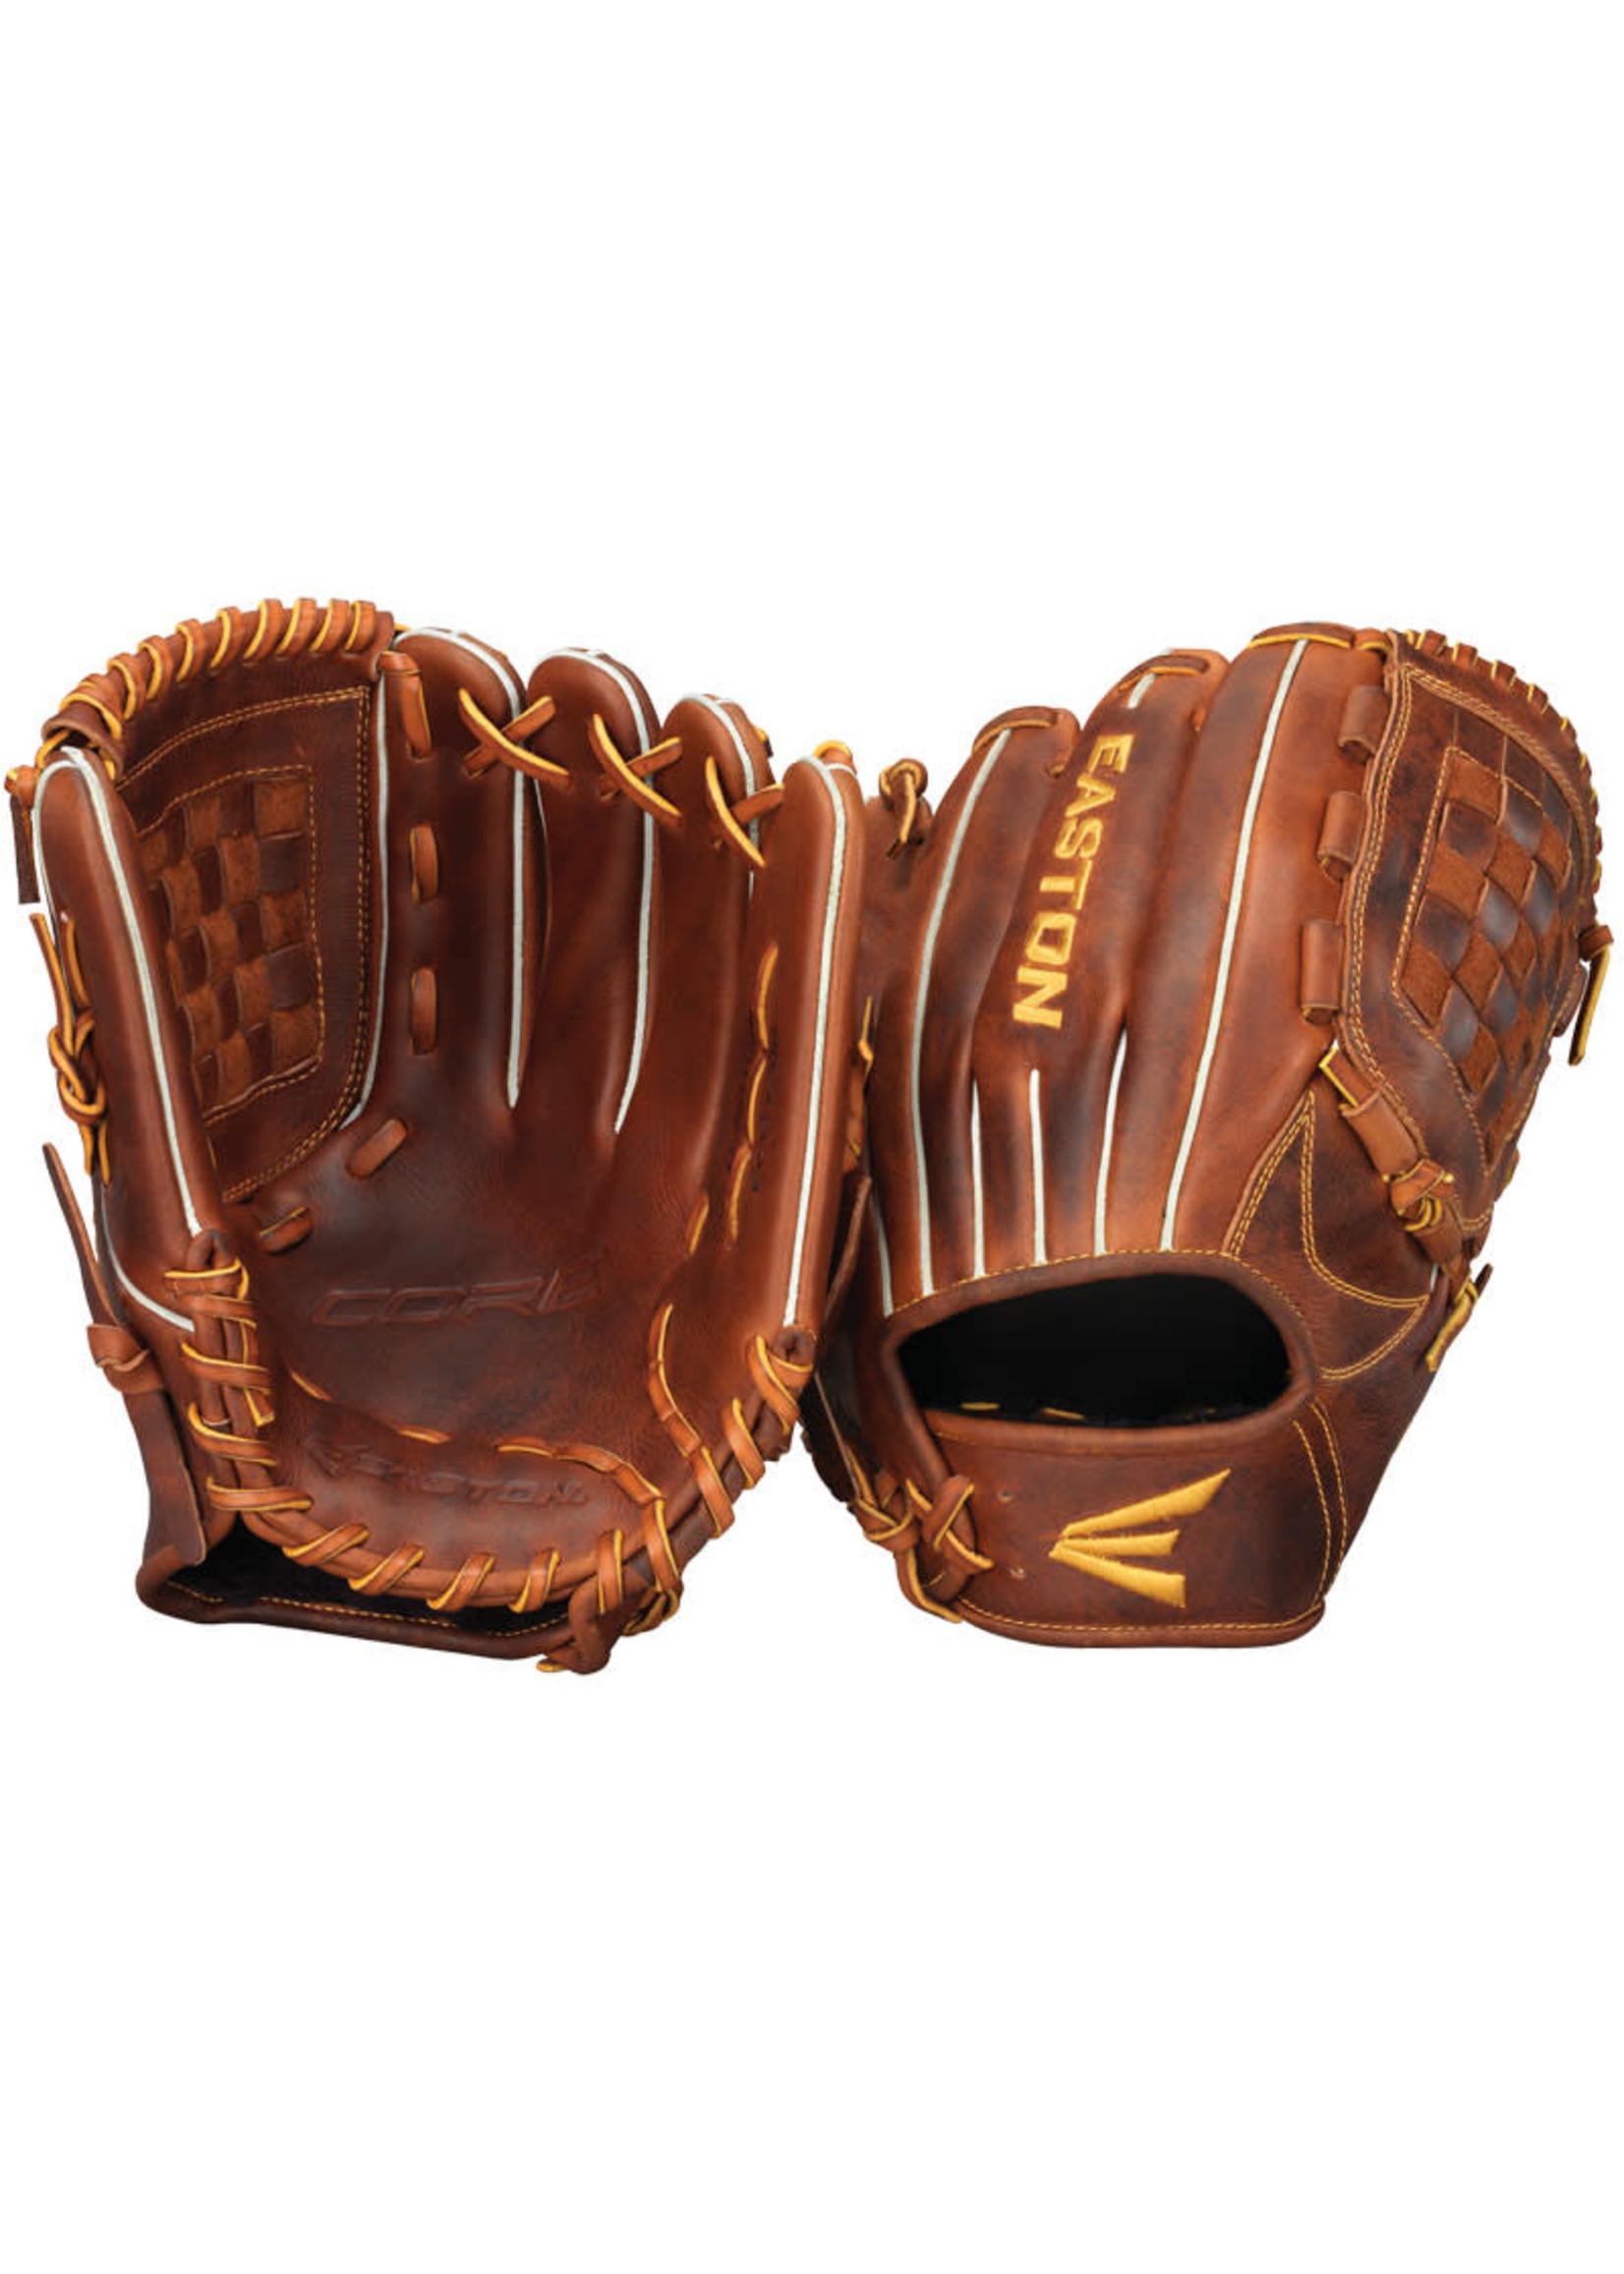 Easton Baseball (Canada) EASTON CORE 12 INCHES LHT